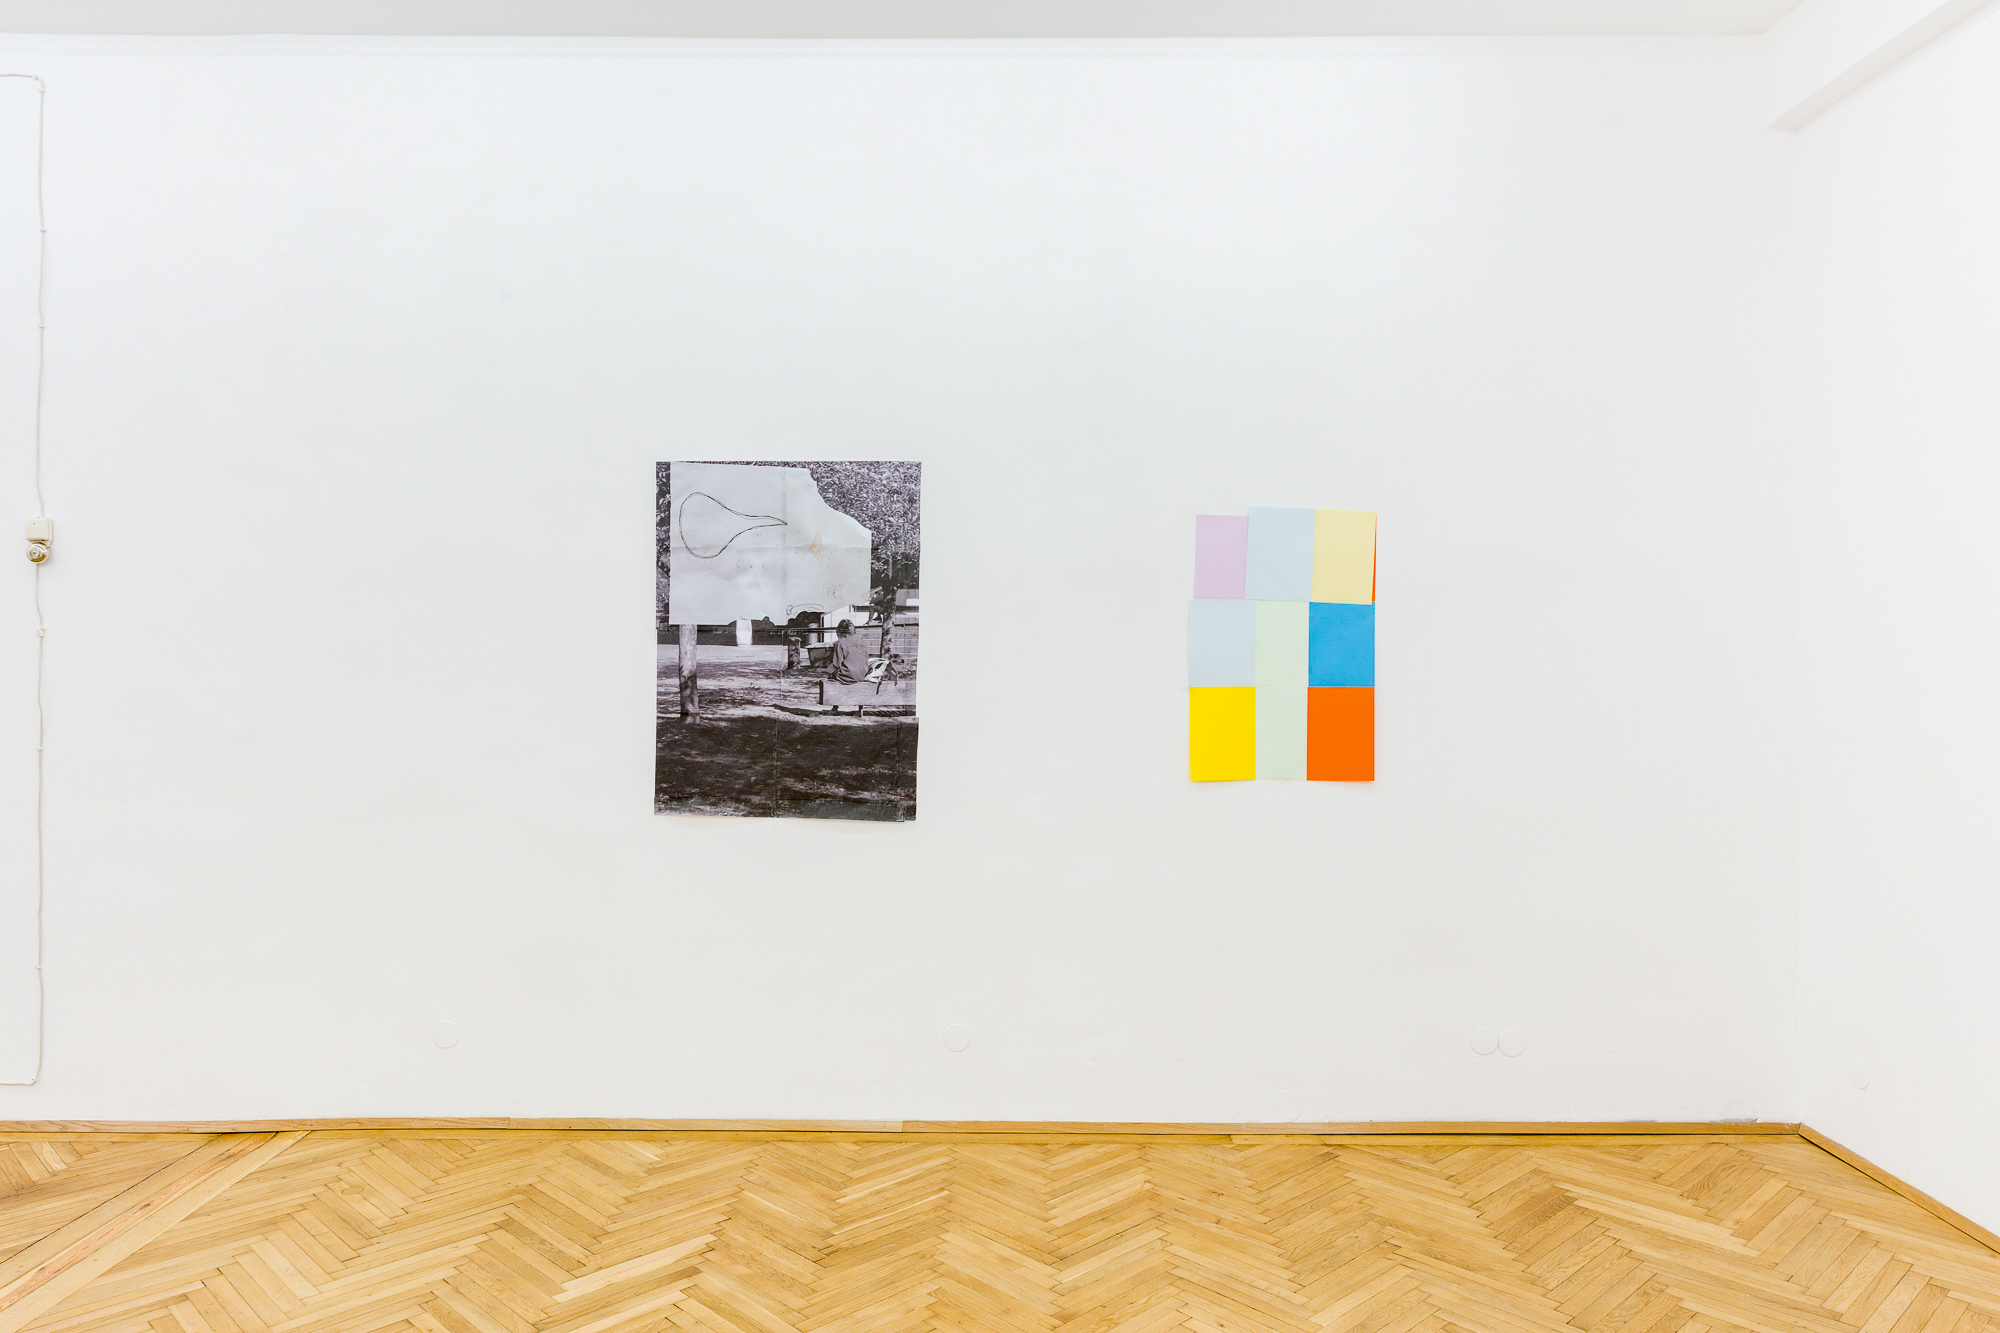 2018_11_08_Vera Lutz at Felix Gaudlitz_by kunst-dokumentation.com_003_web.jpg